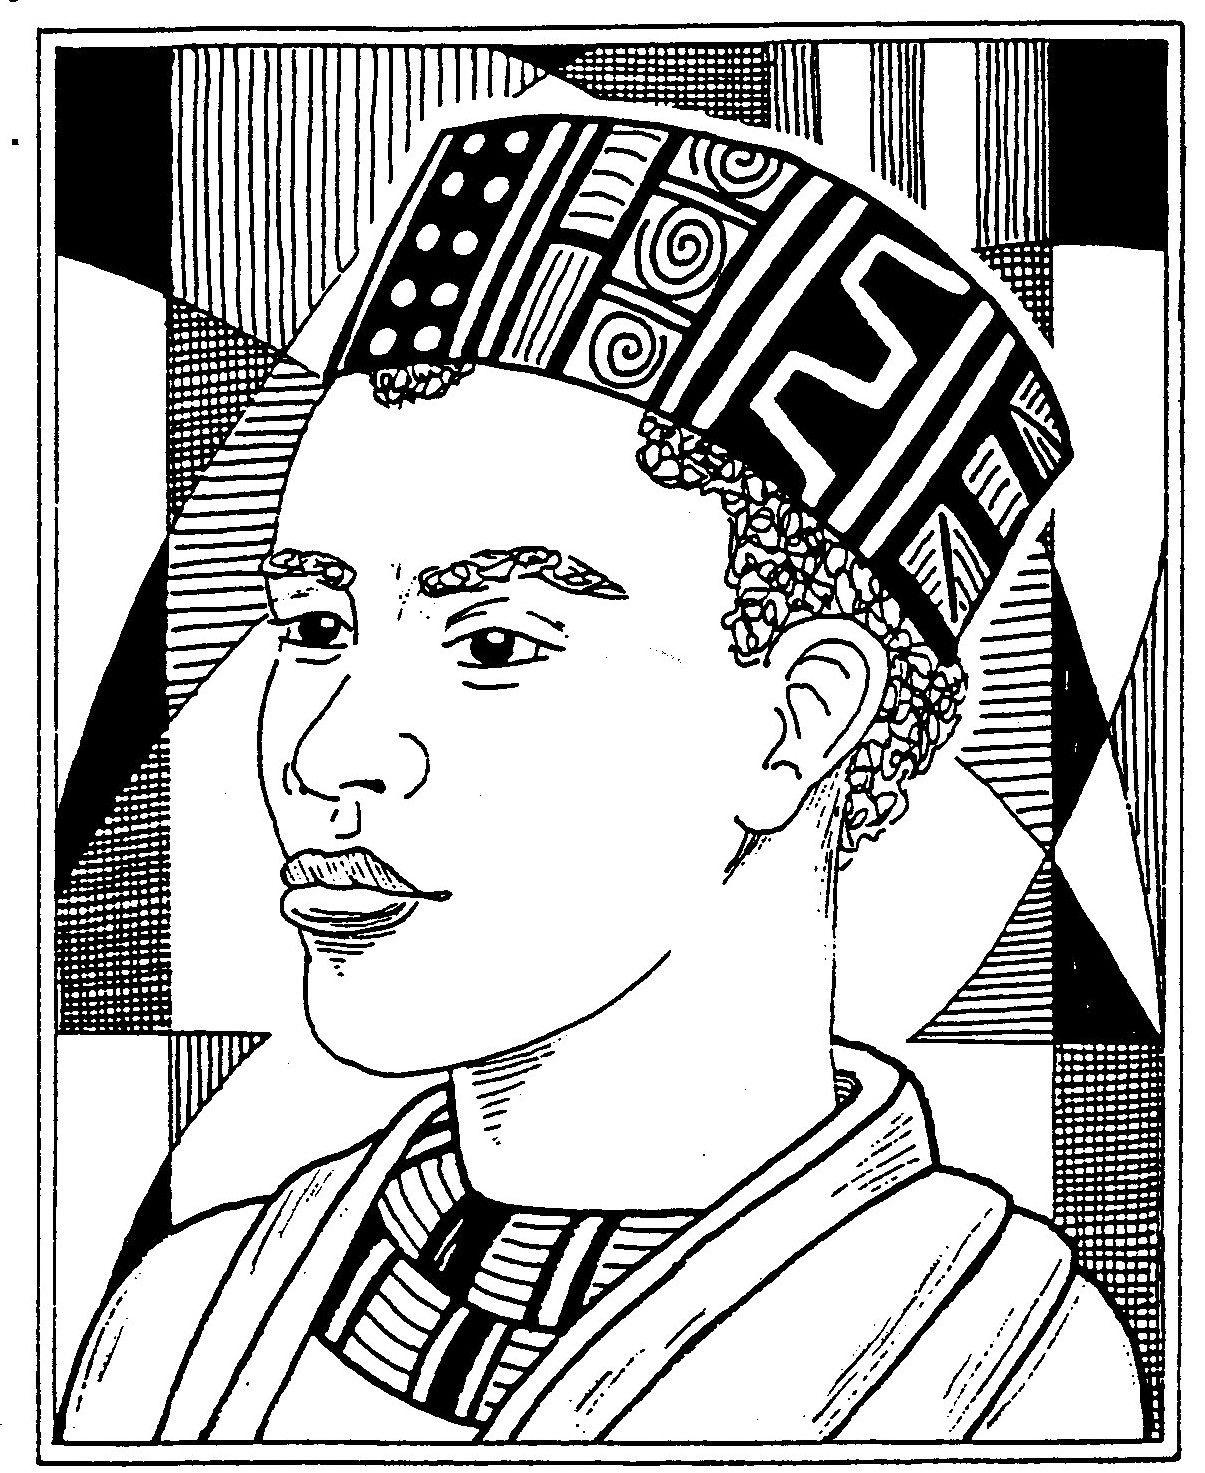 African Coloring Pages Desenho Africano Dia Da Conciencia Negra Dia Da Consciencia Negra